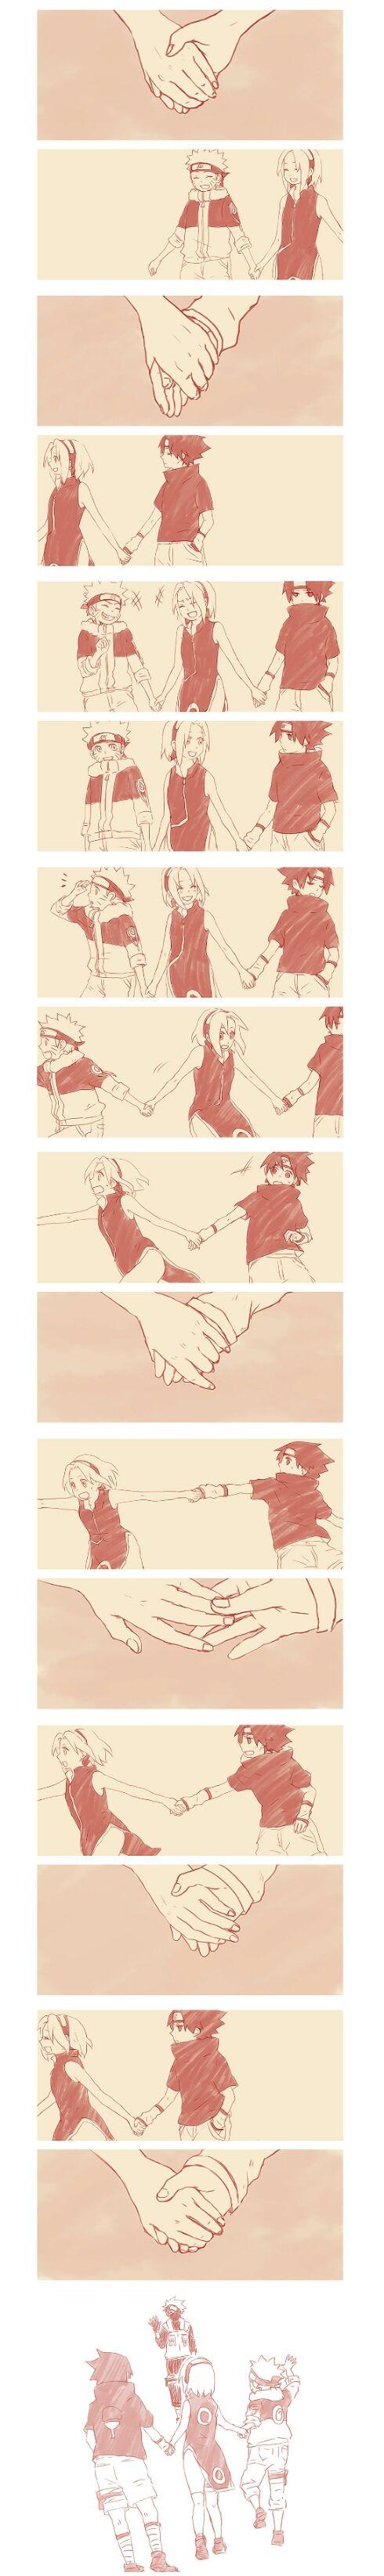 Sasuke refused to let her go! つなぐ手